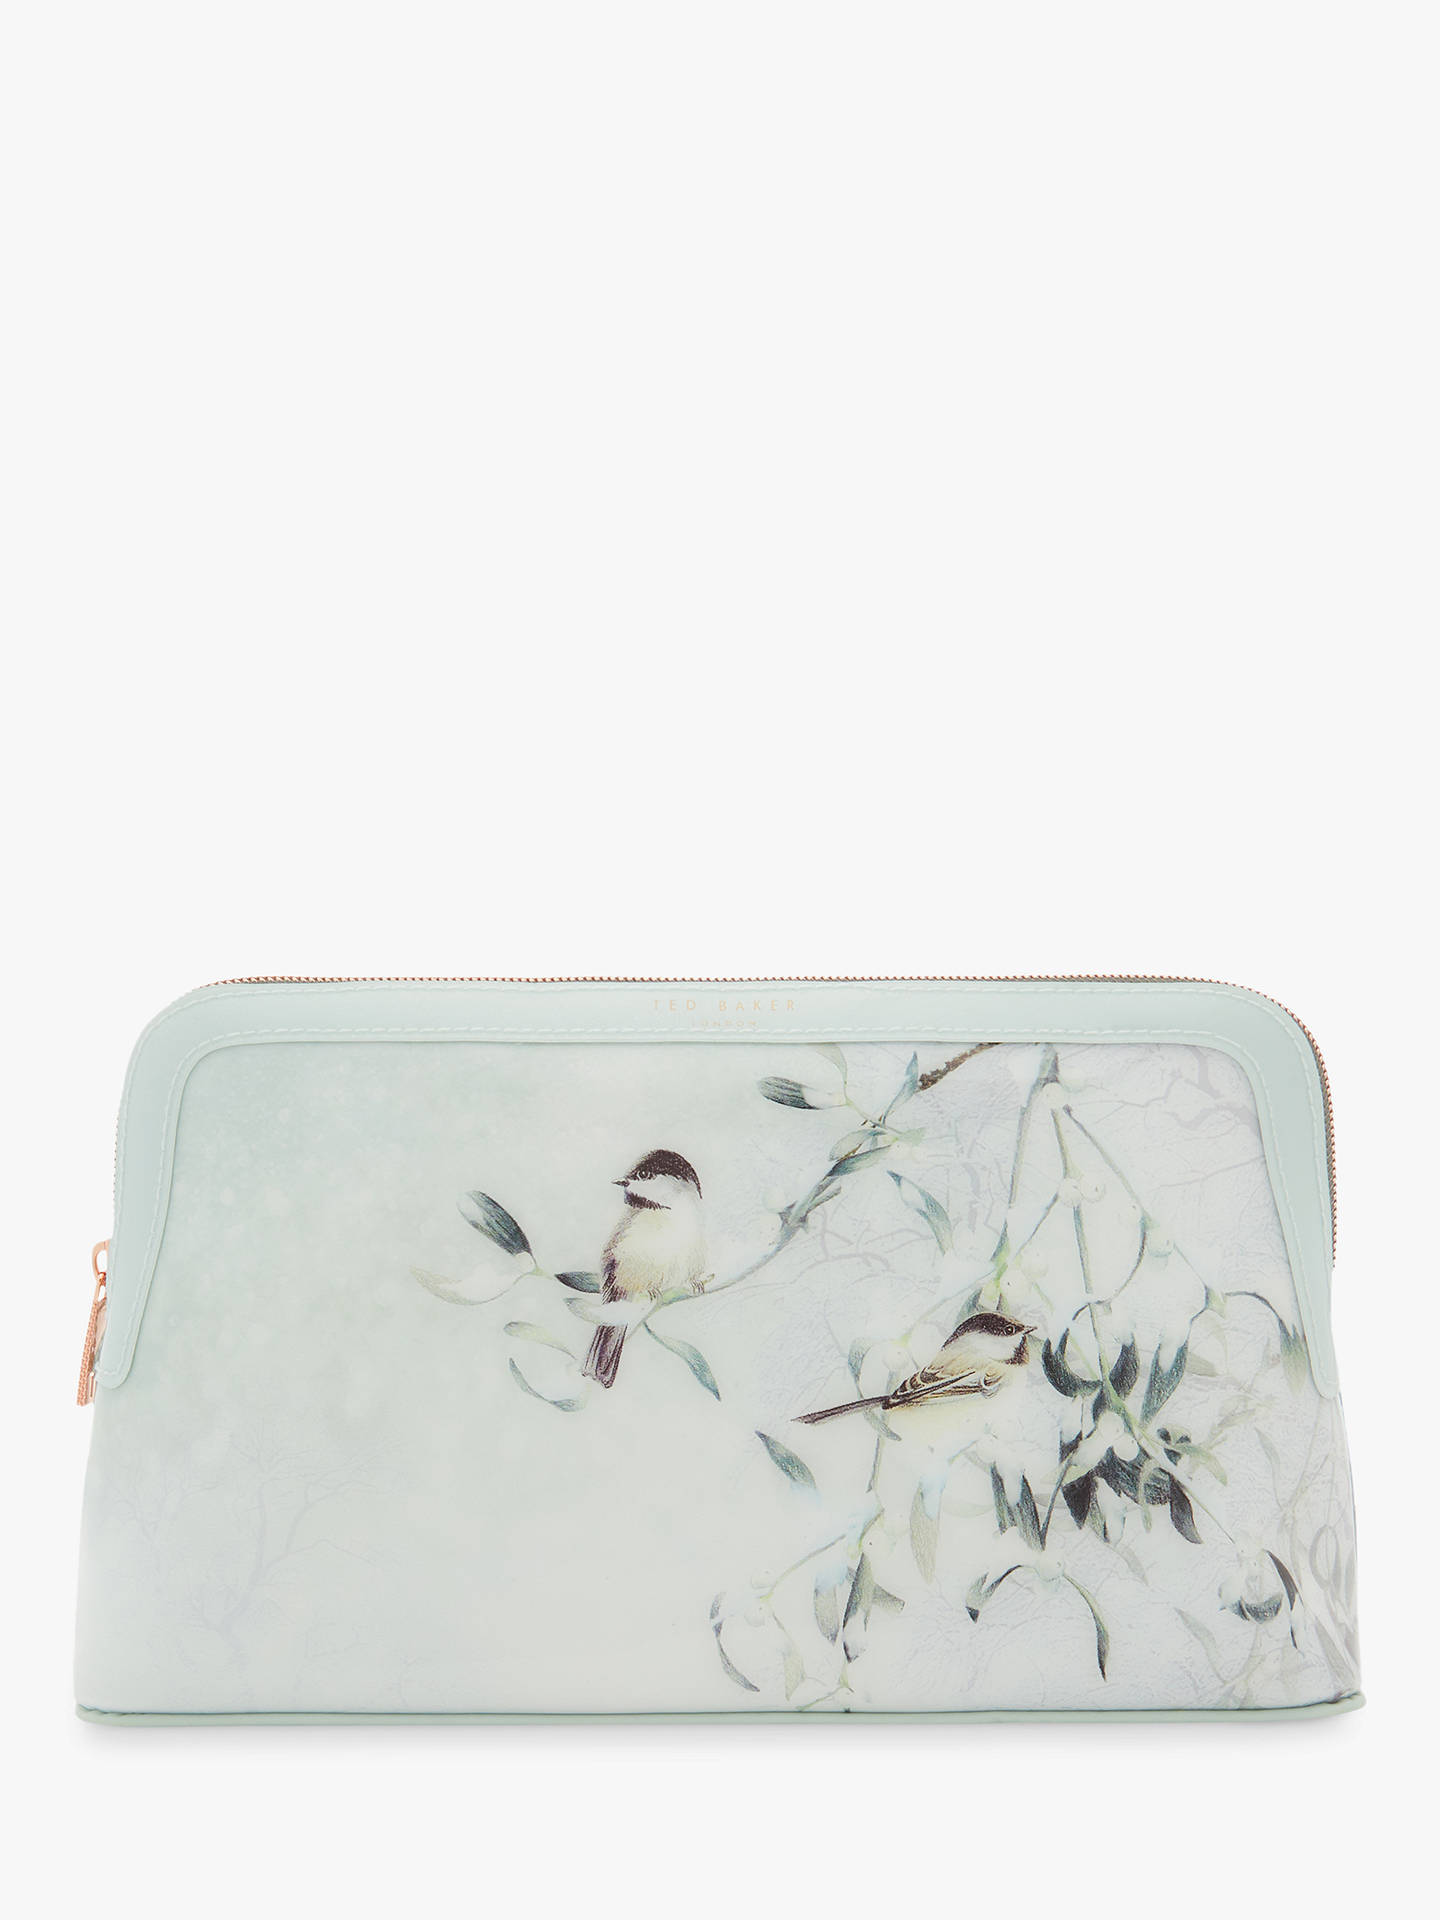 BuyTed Baker Asteria Mistletoe Kiss Wash Bag, Mint Online at johnlewis.com  ... 8fb3aef17d